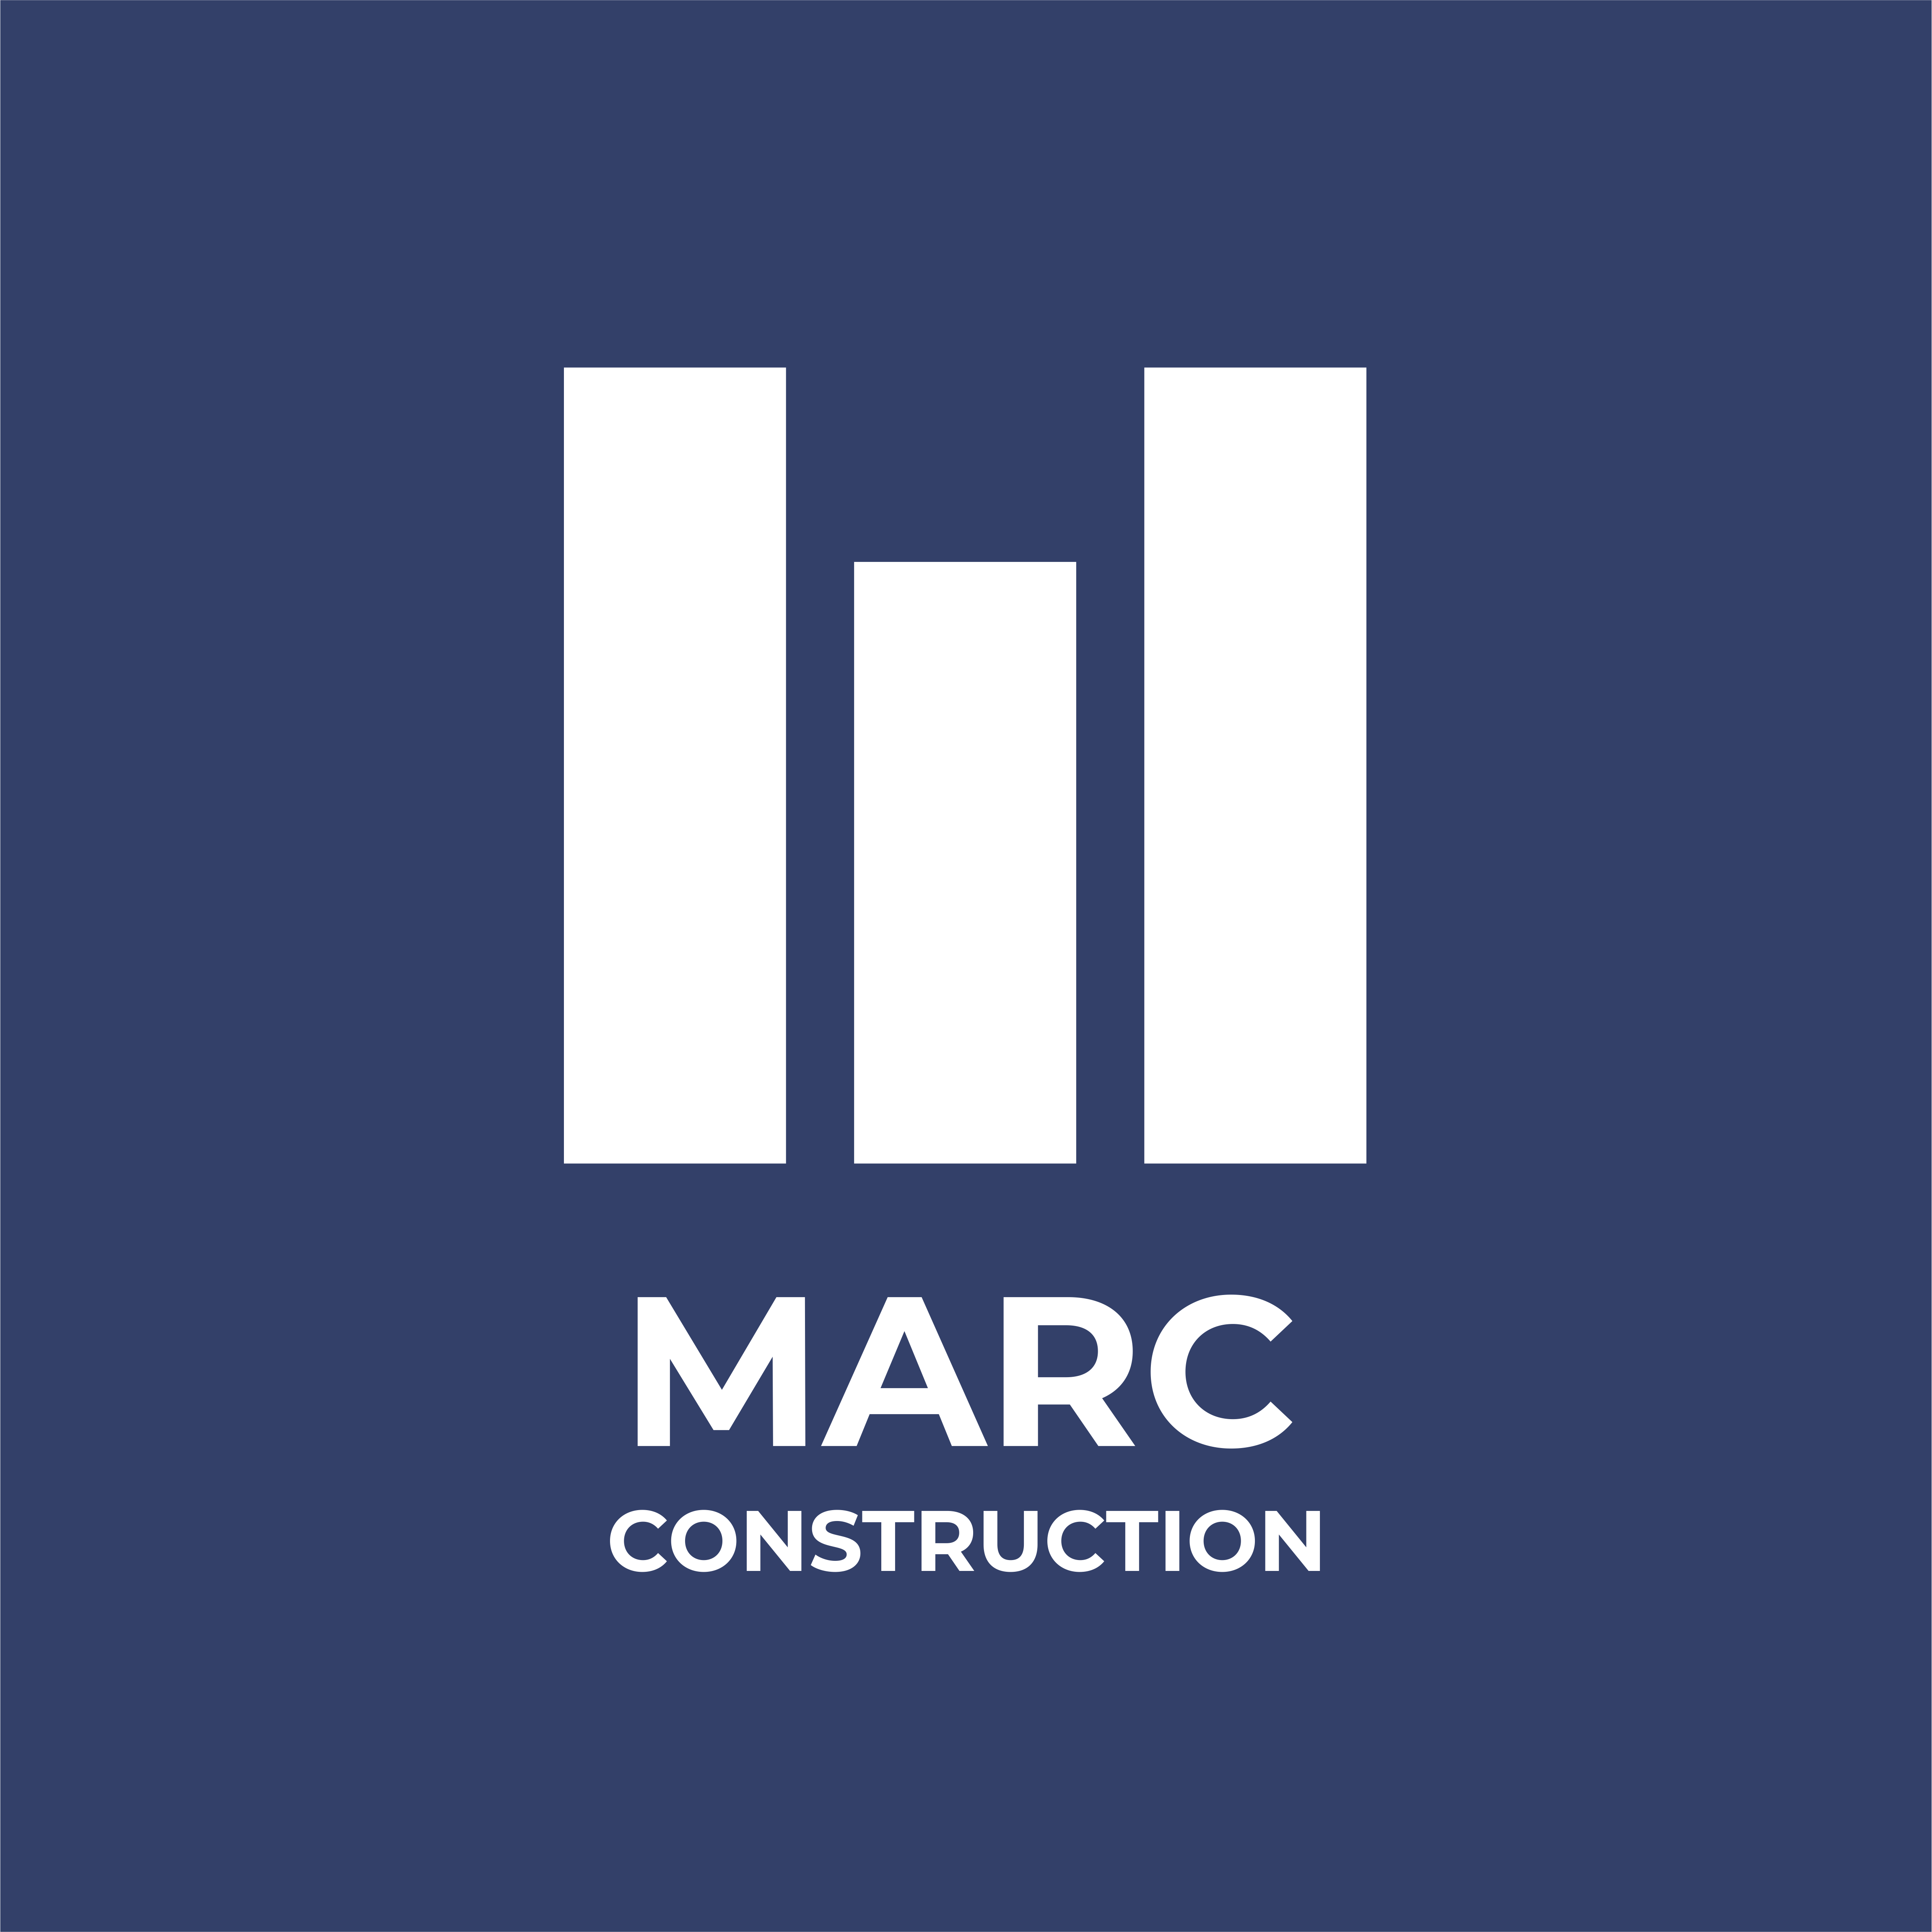 Marc Construction